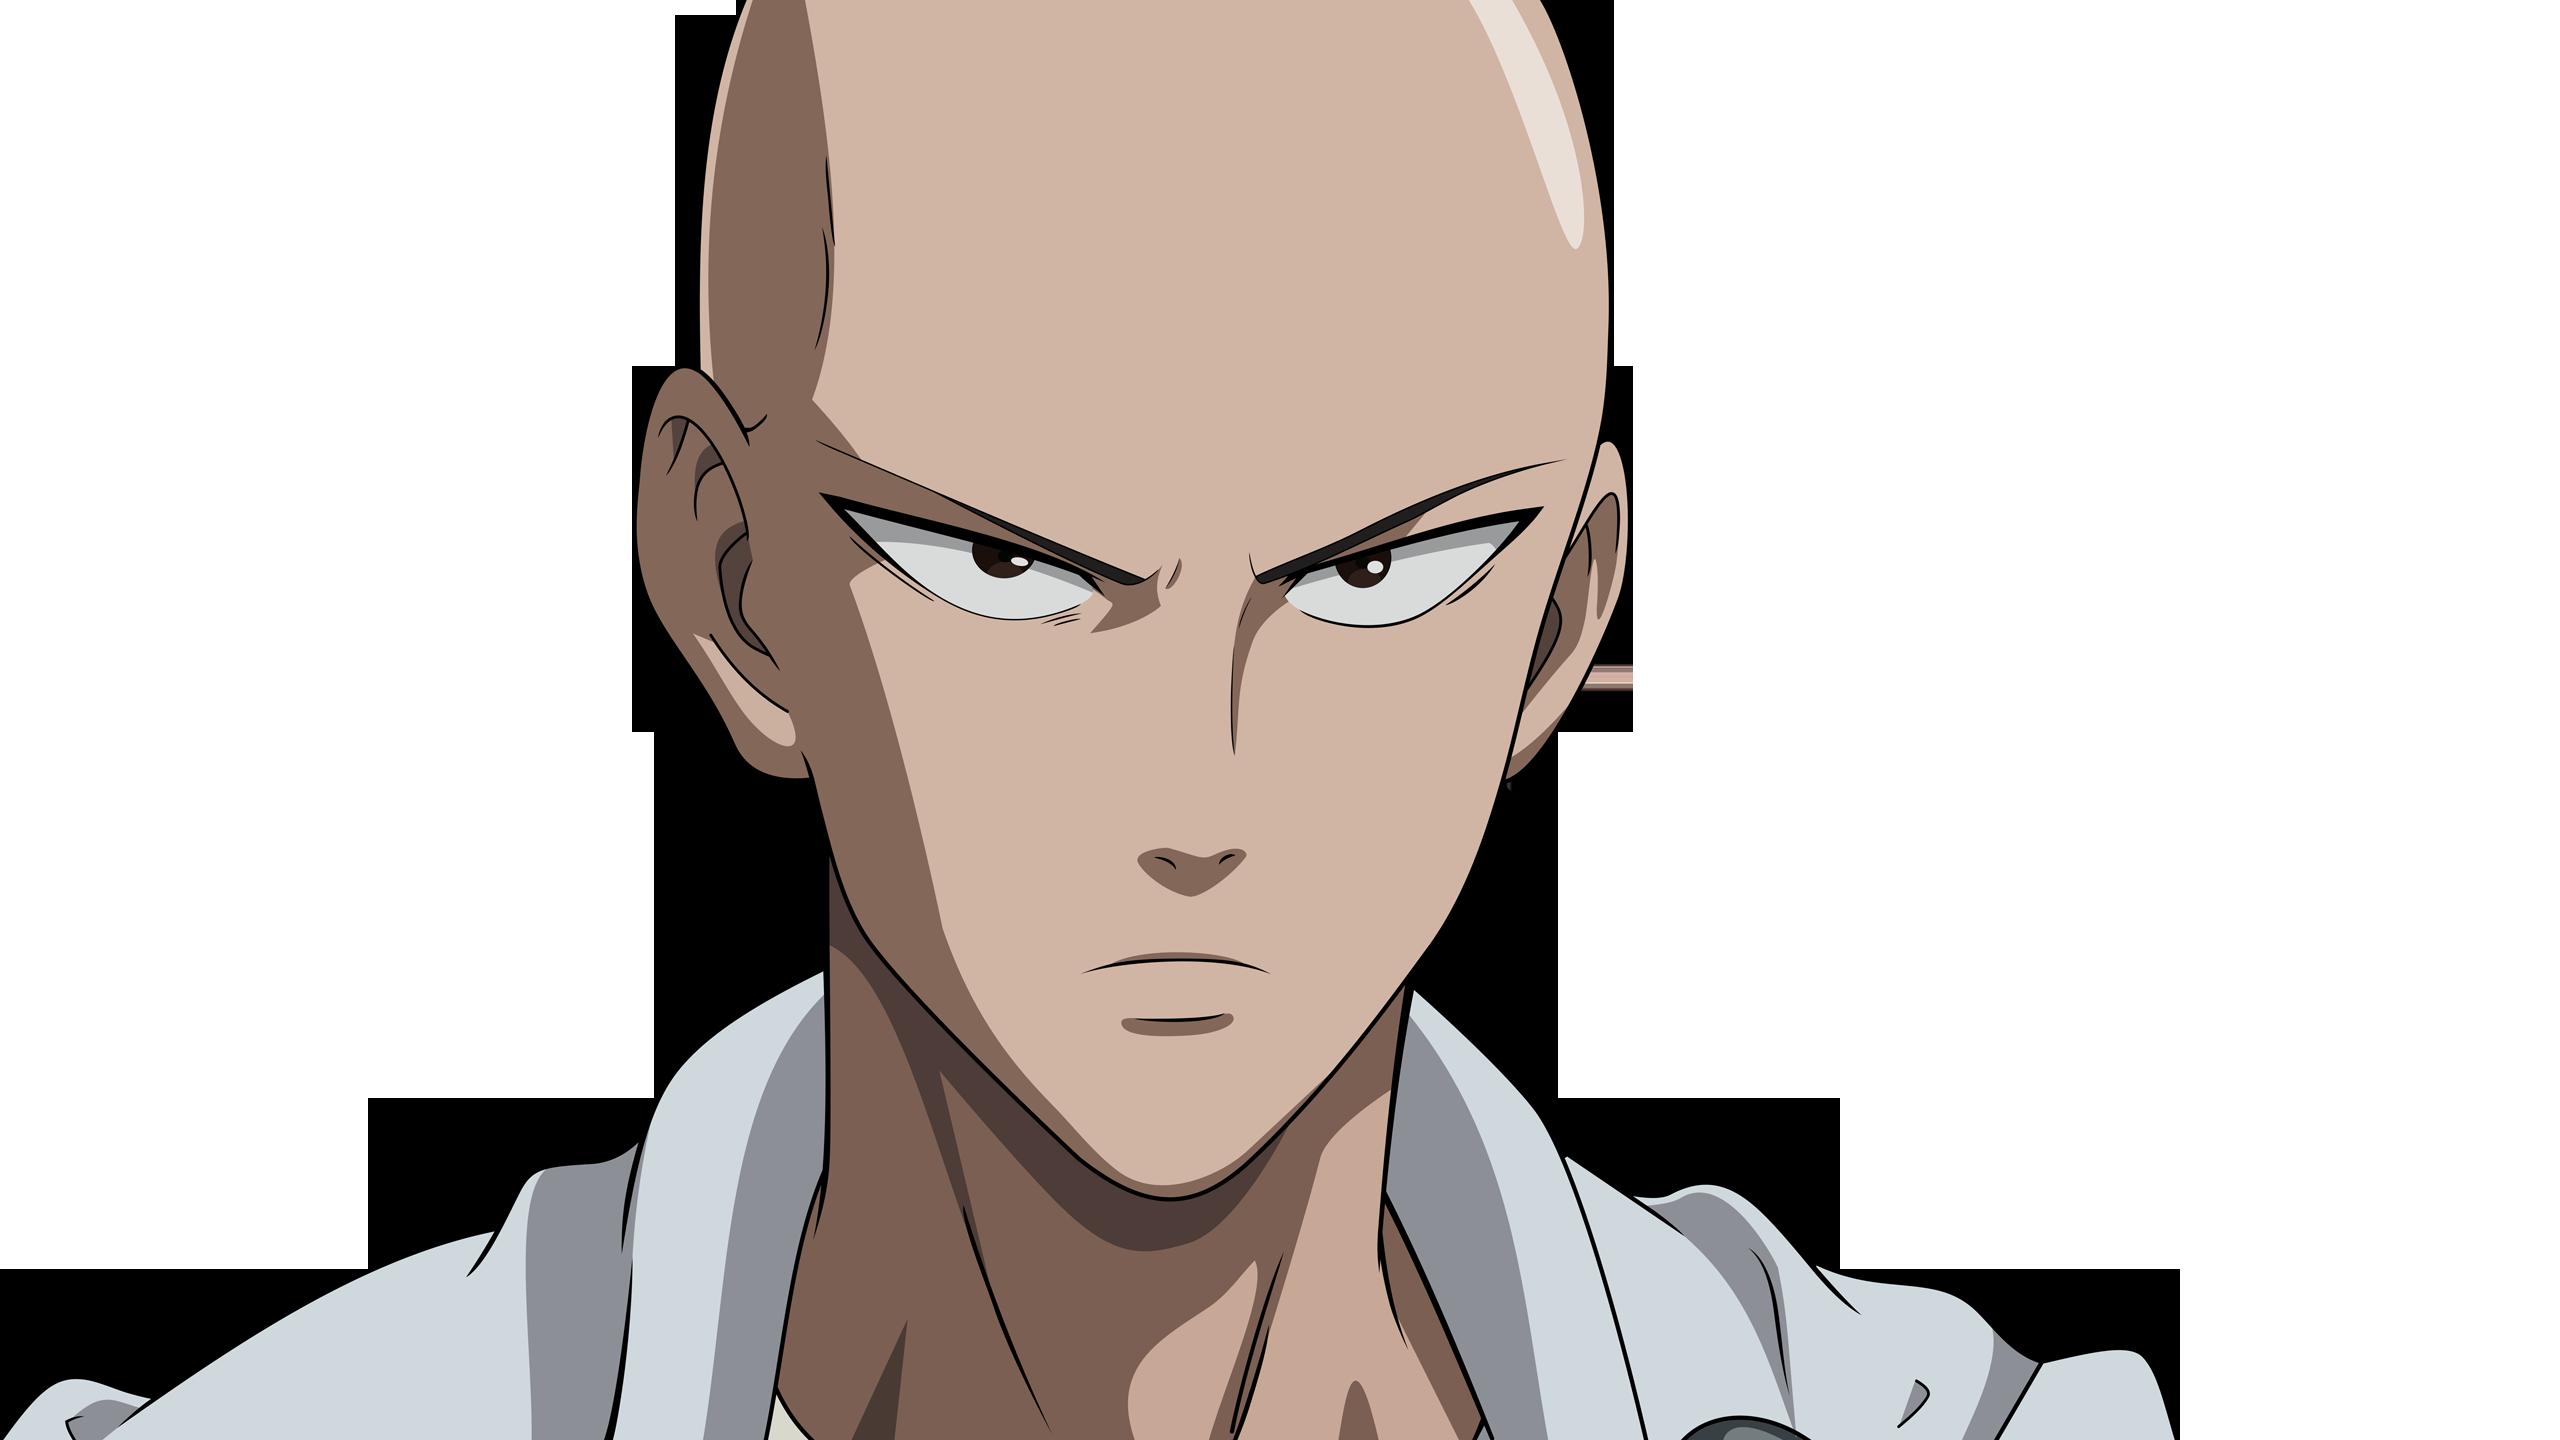 Saitama Cool Face One Punch Man HD Wallpaper Badass